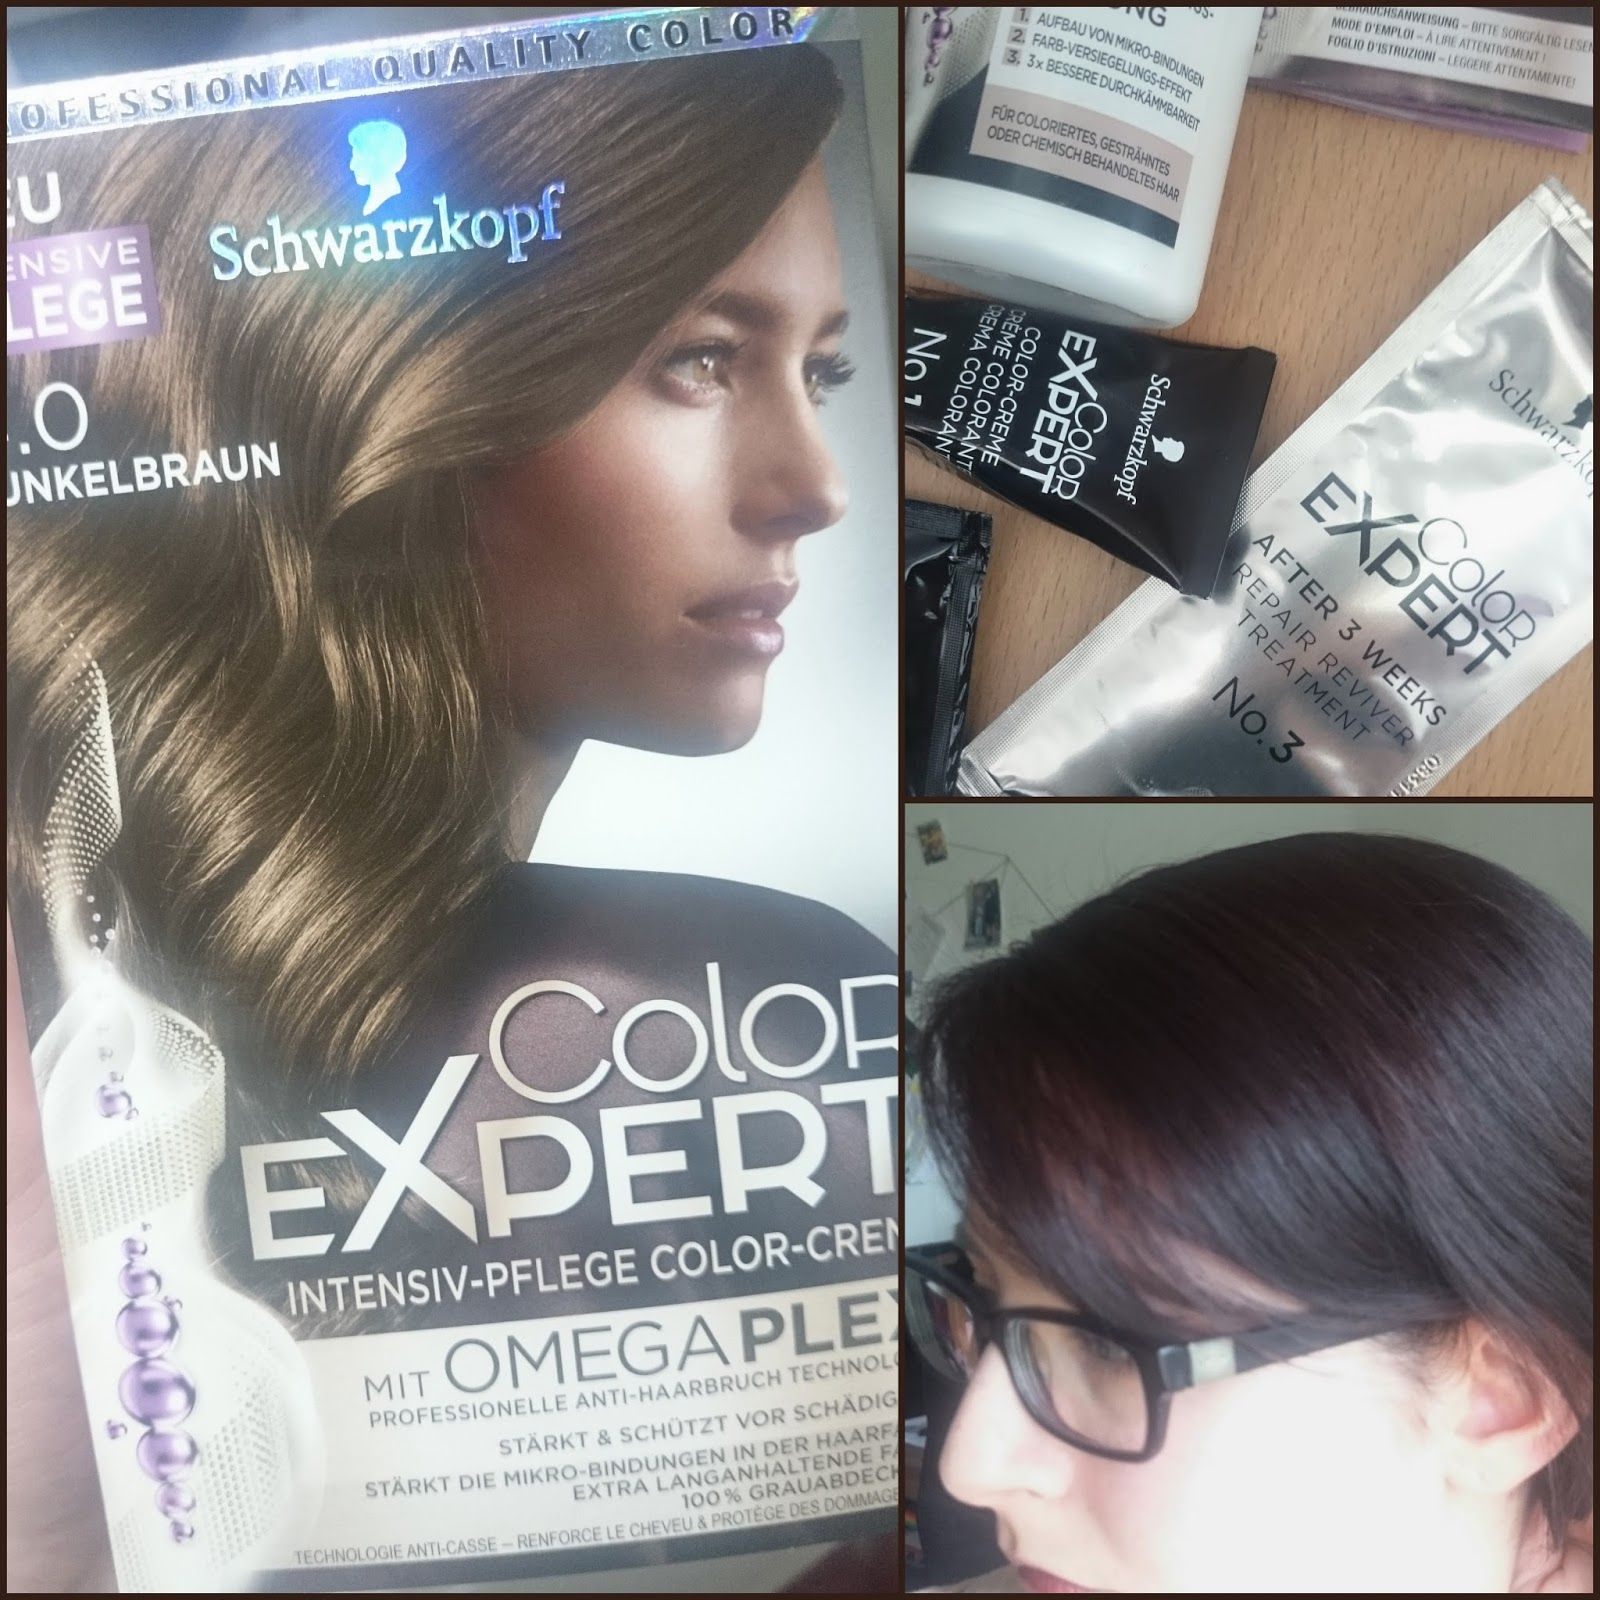 Beauty] Schwarzkopf Color Expert Intensiv Pflege Color Creme mit